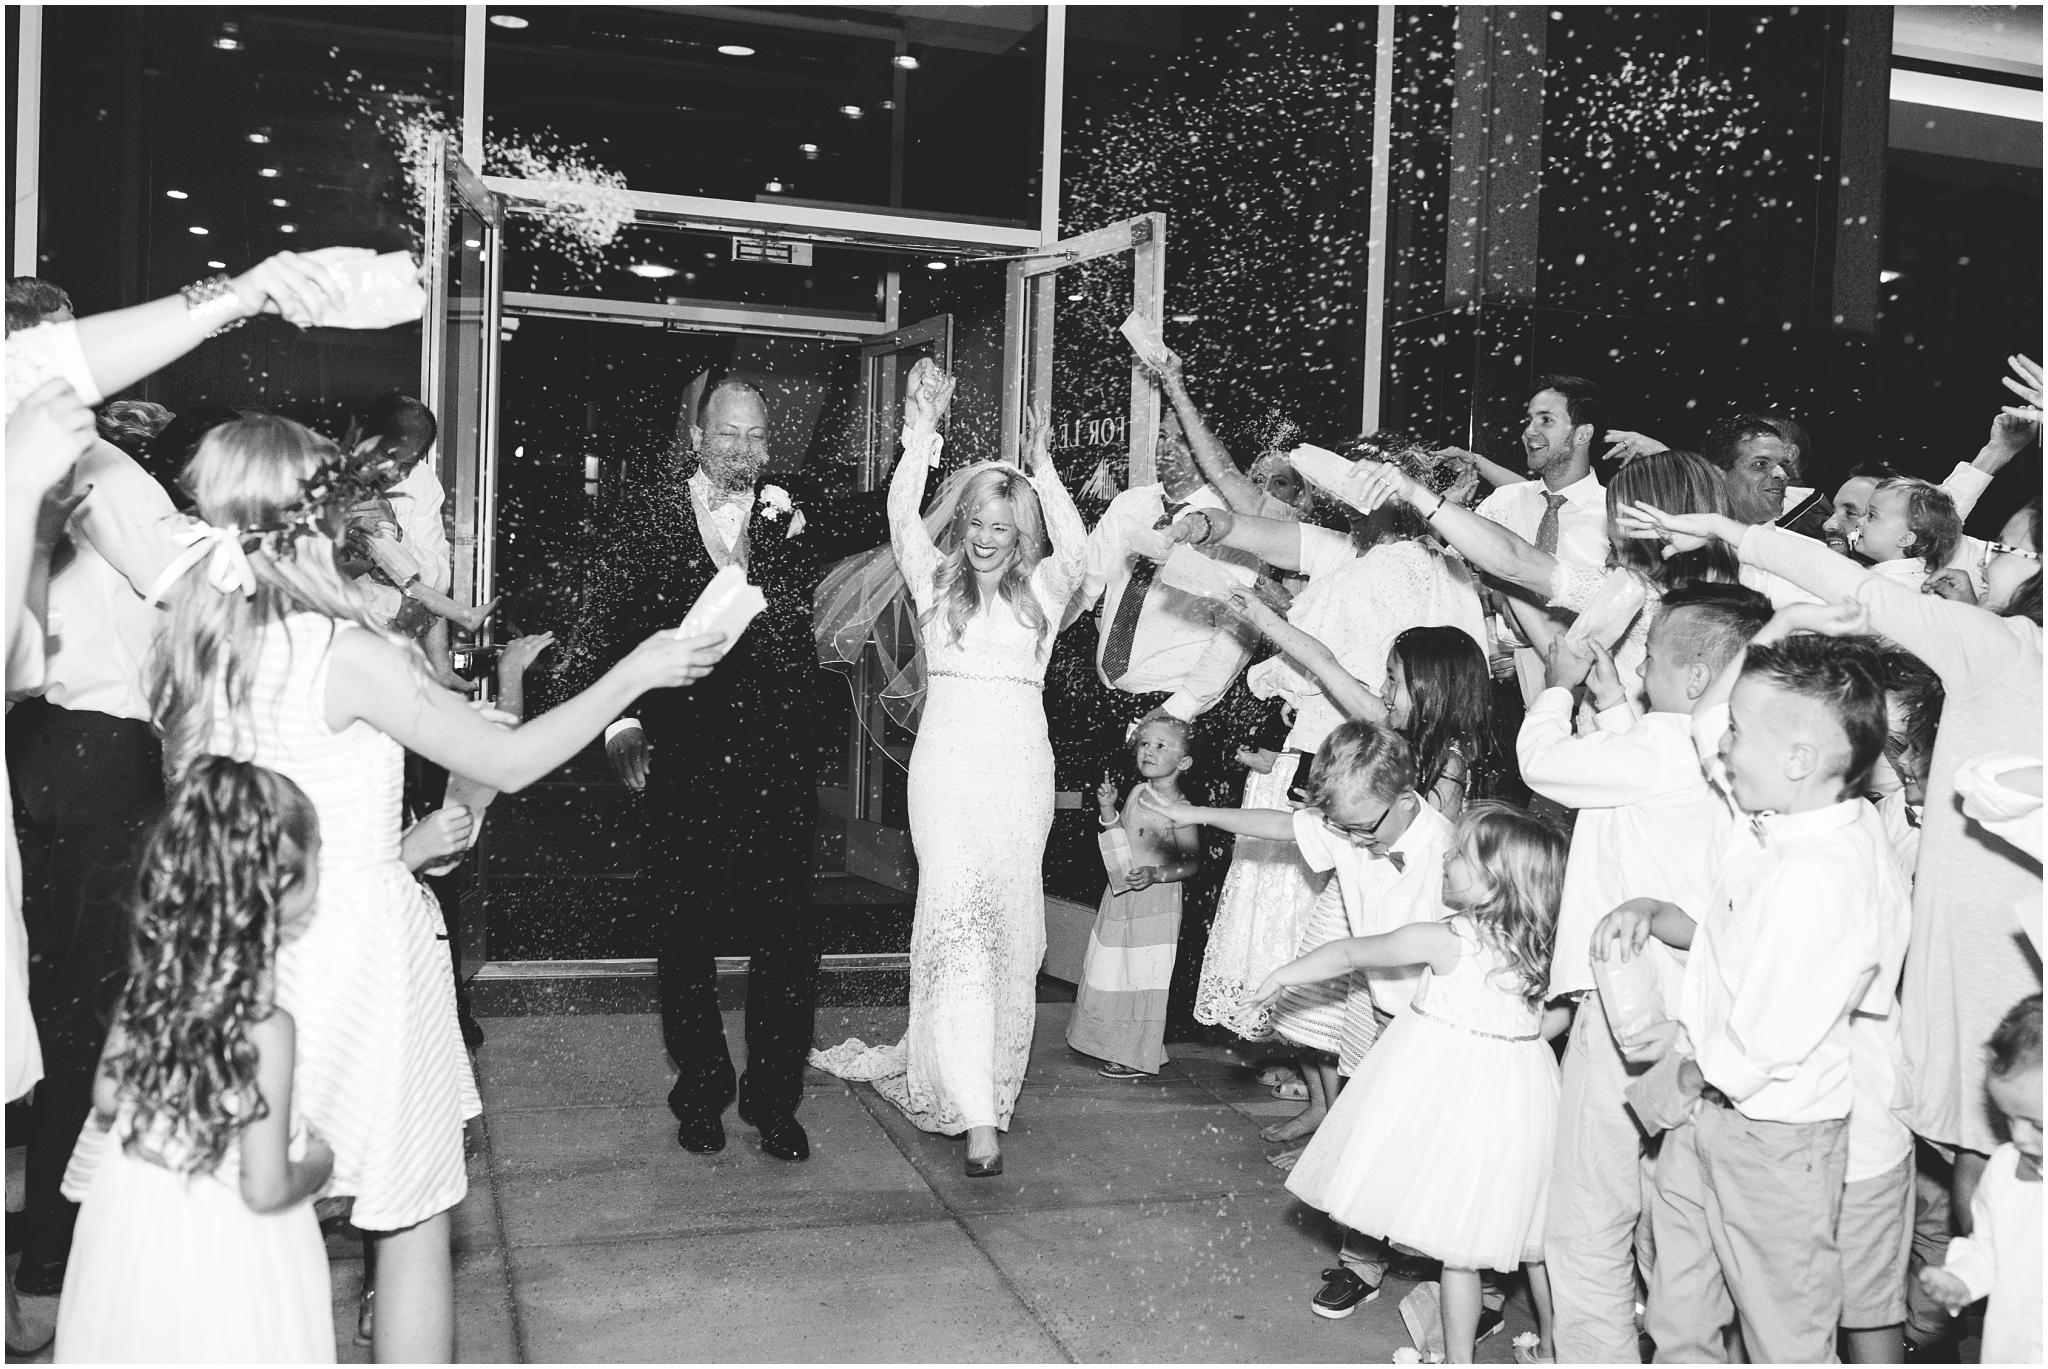 CherylandTyler-652_Lizzie-B-Imagery-Utah-Wedding-Photographer-Salt-Lake-City-Temple-Wells-Fargo-Building-Reception.jpg